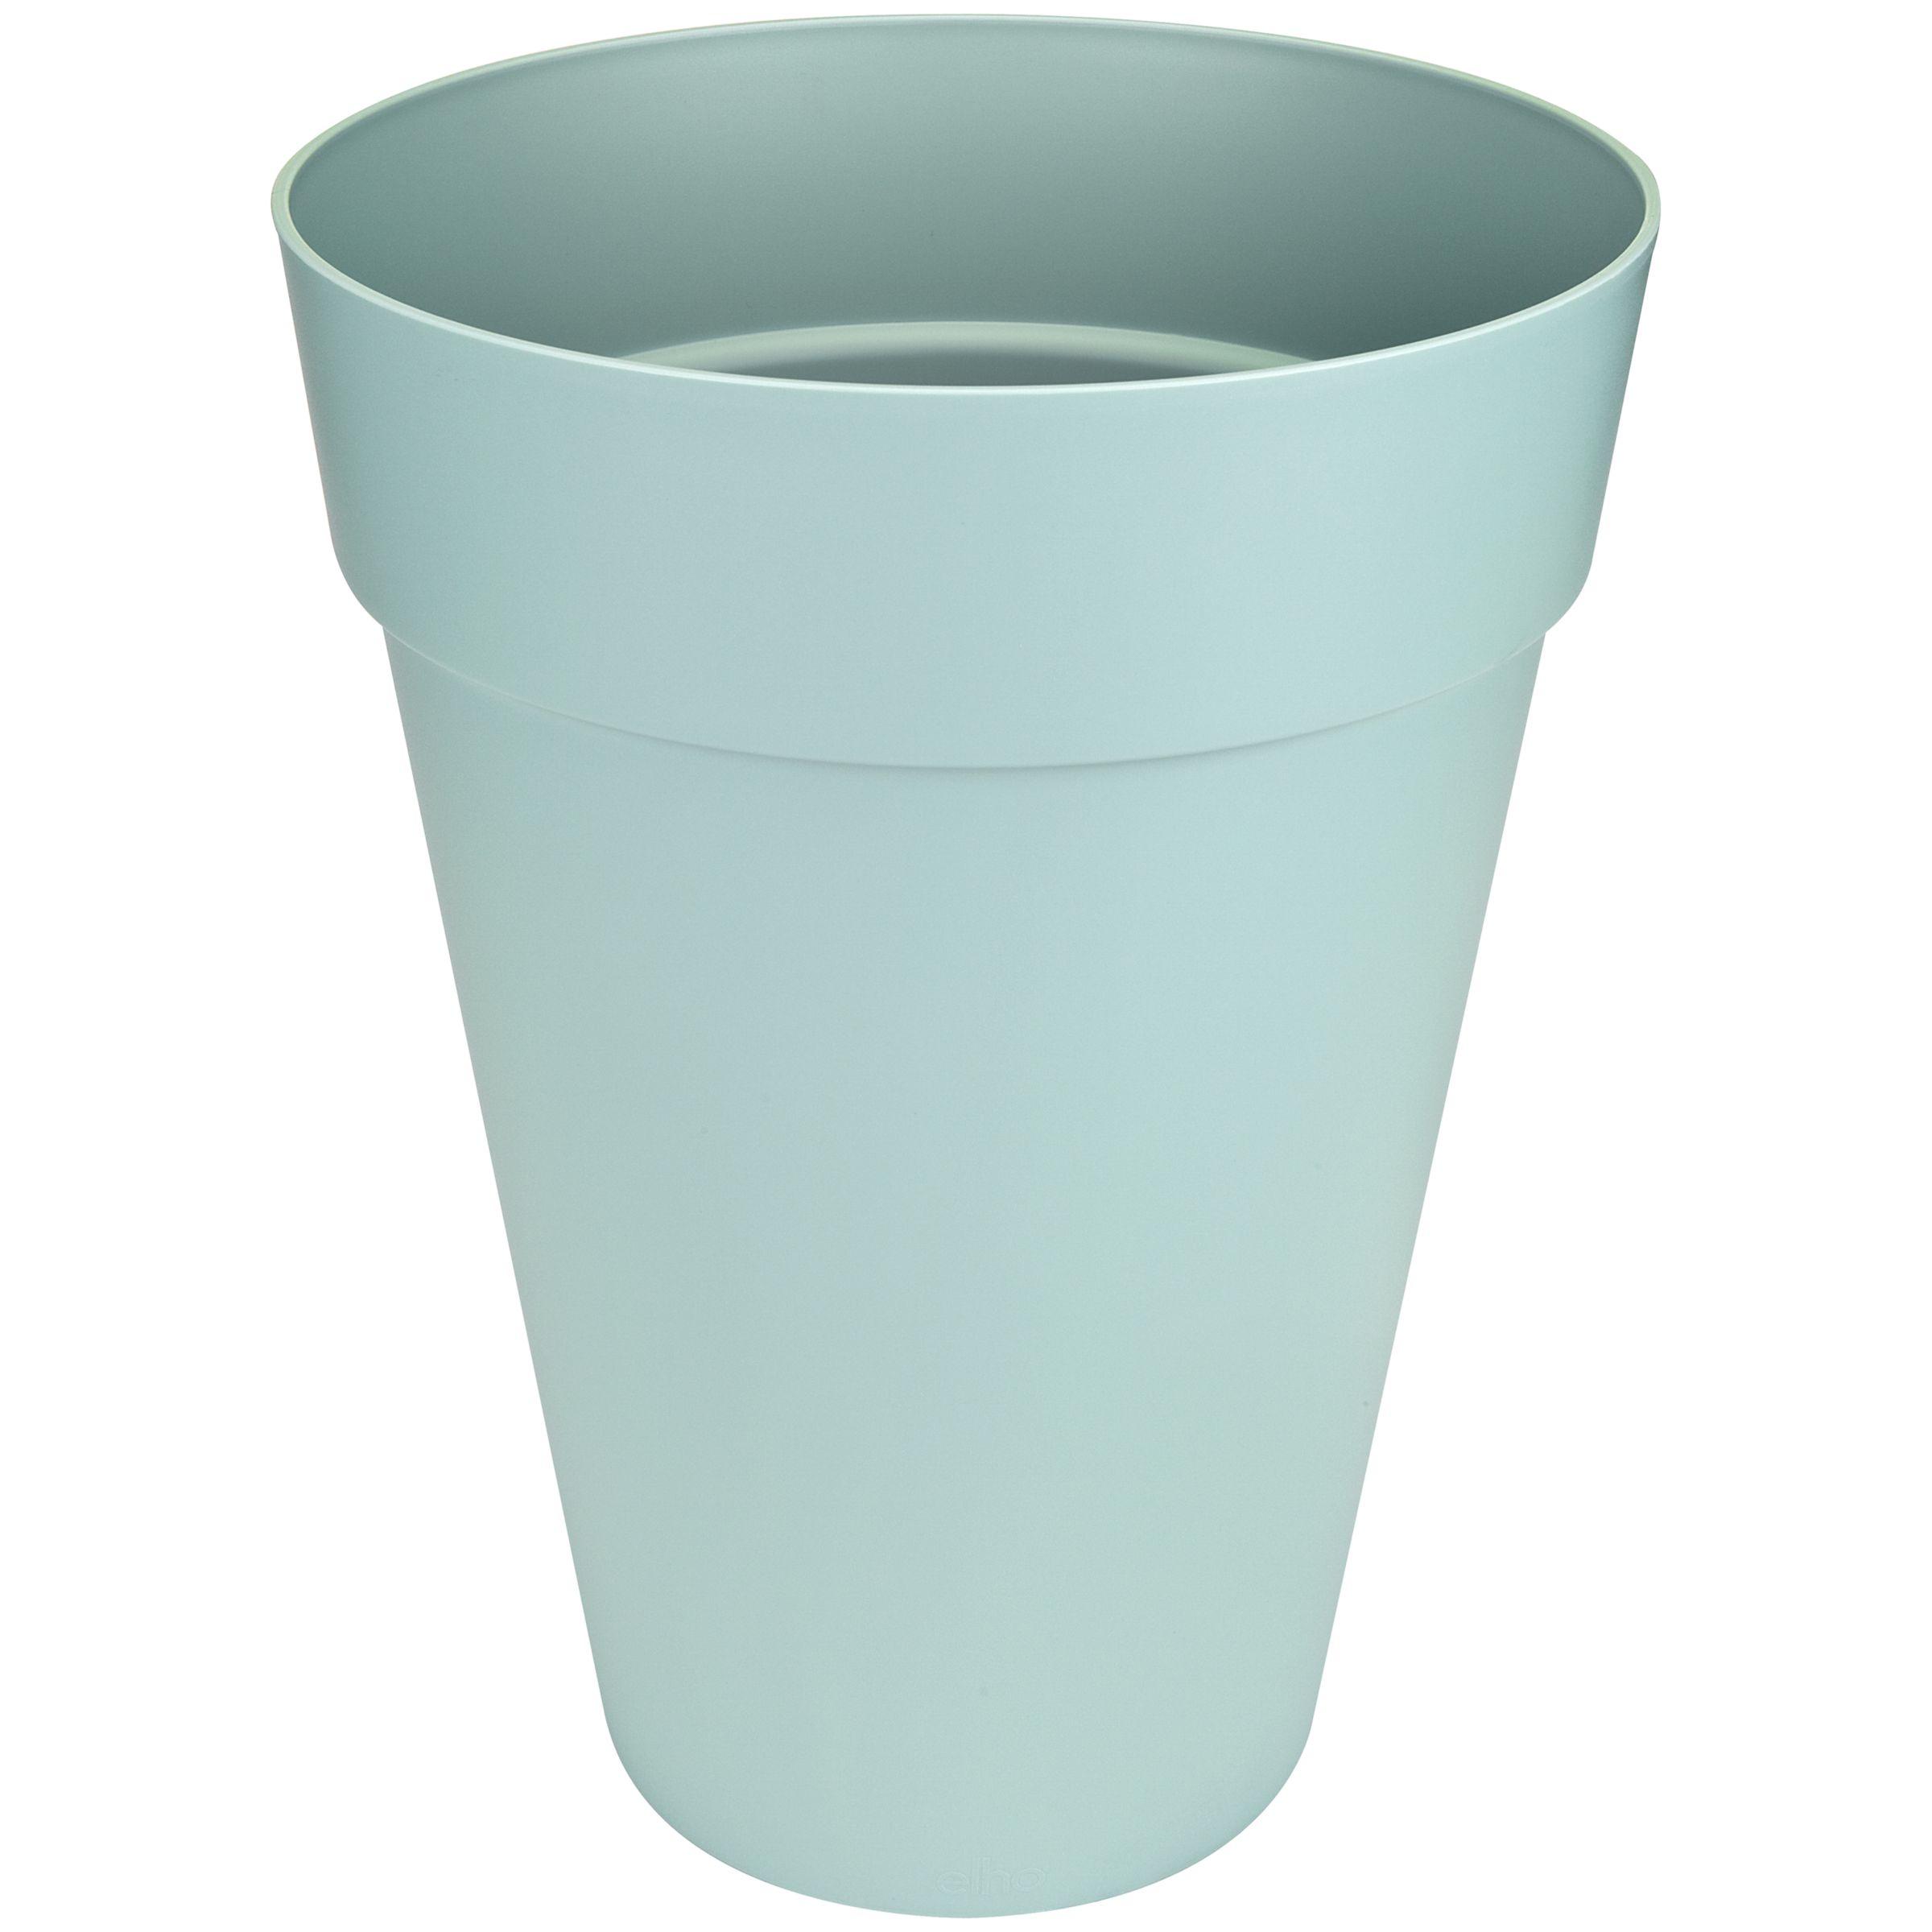 Elho Loft Planter Round, Mint